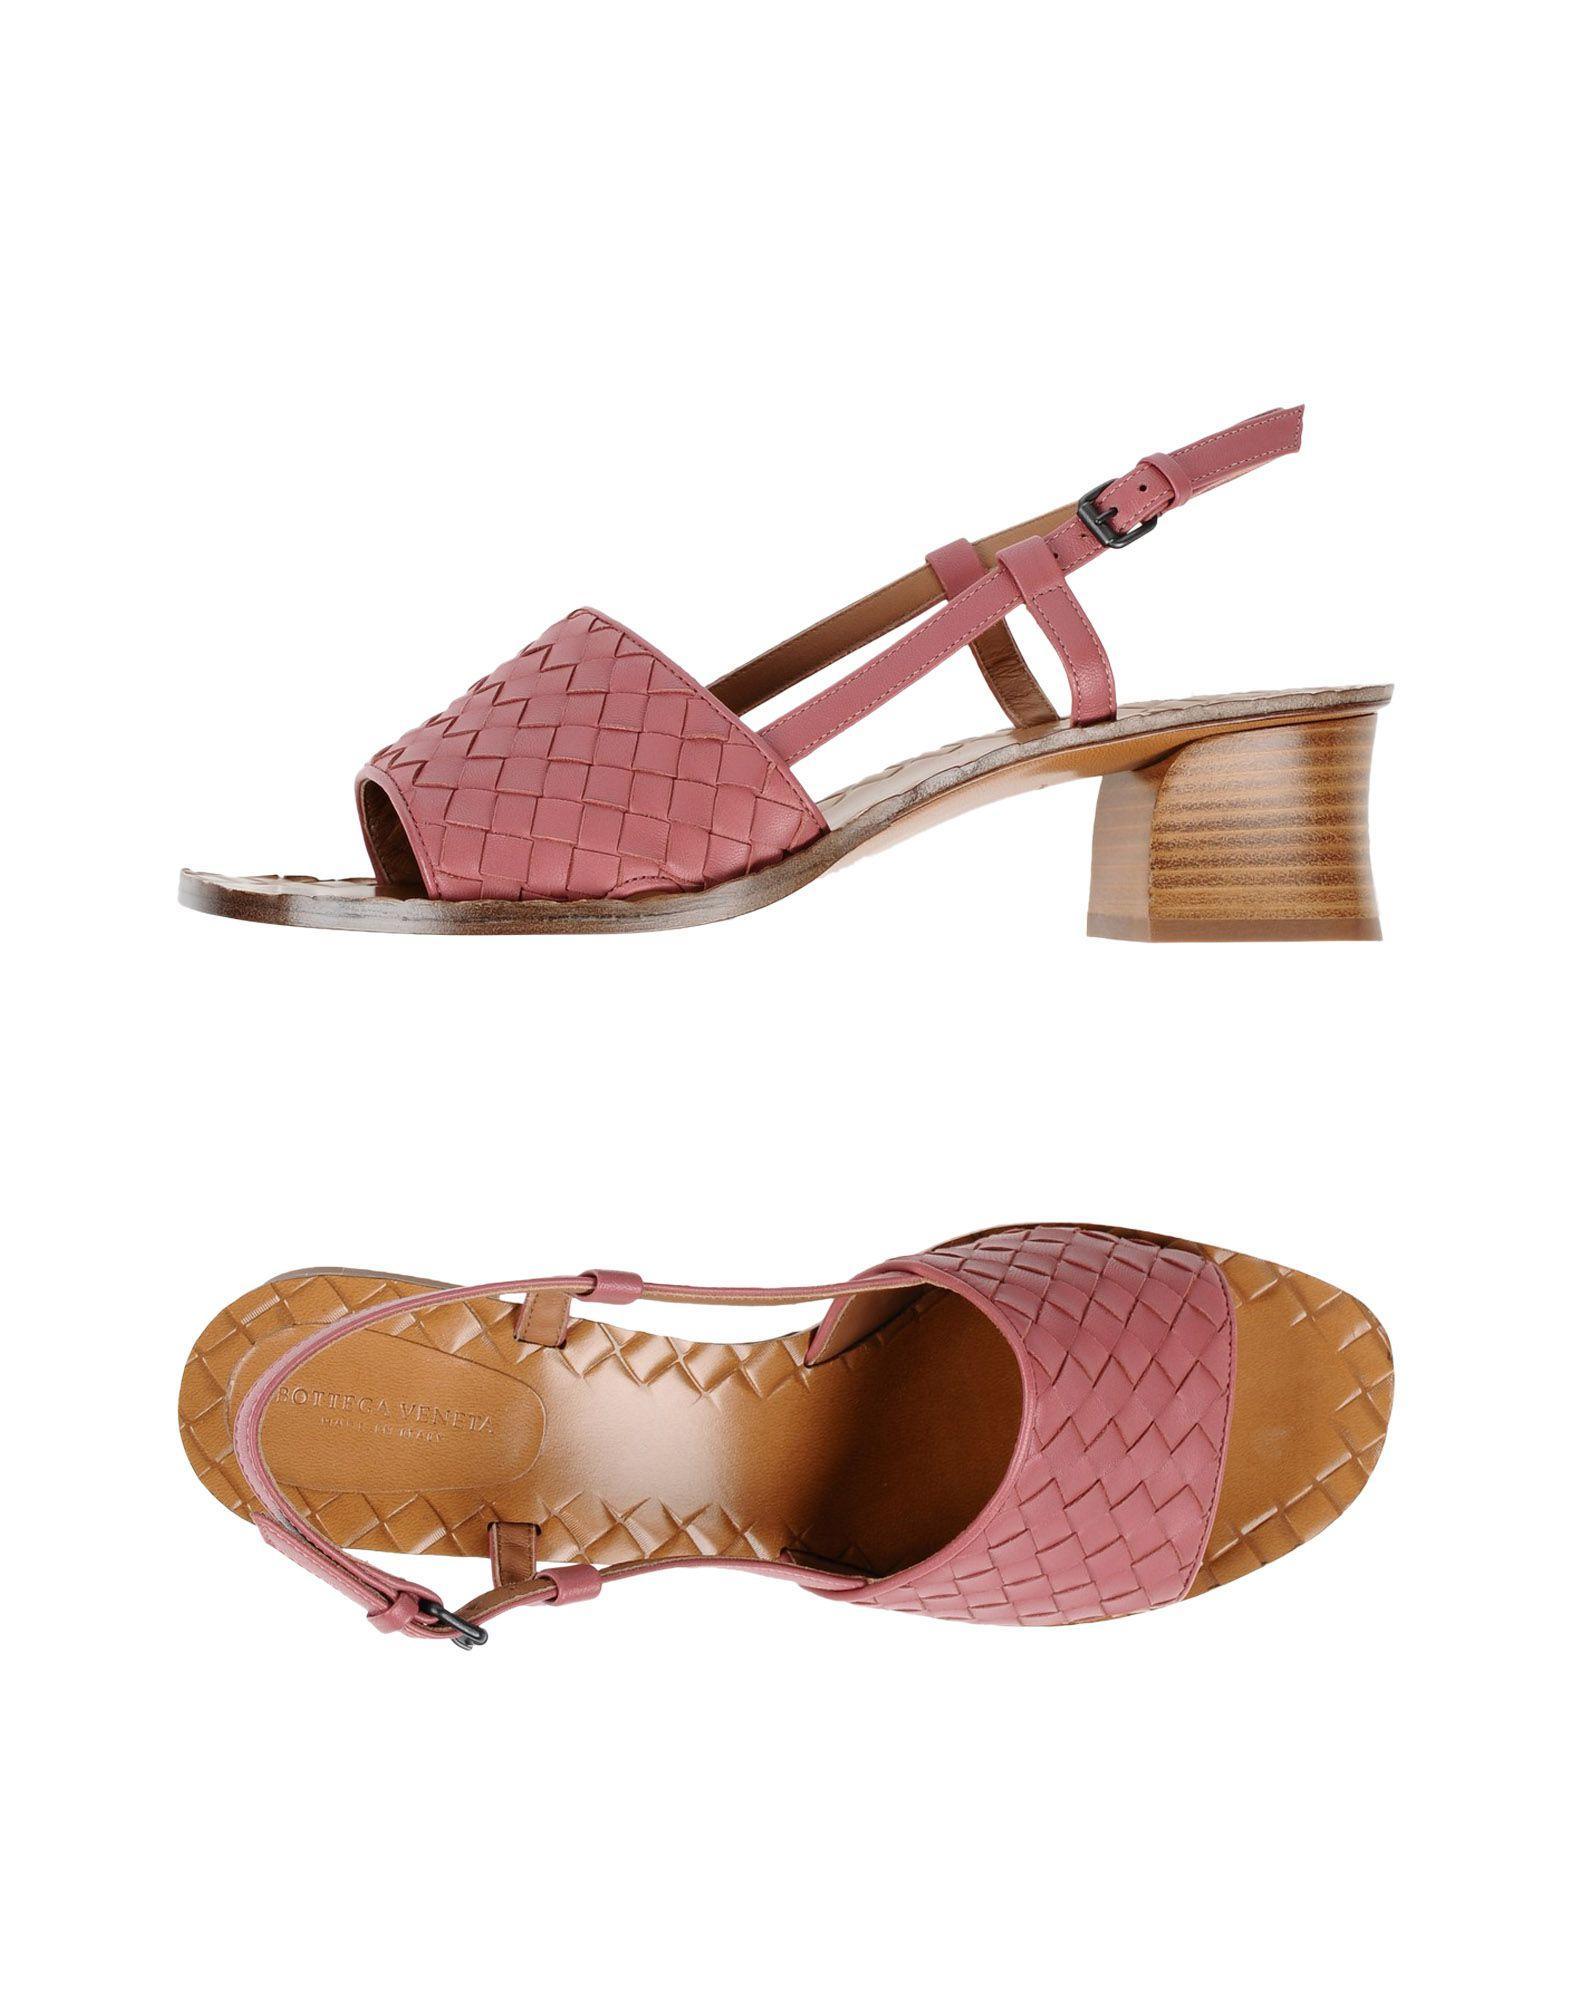 Bottega Veneta Sandals In Pastel Pink